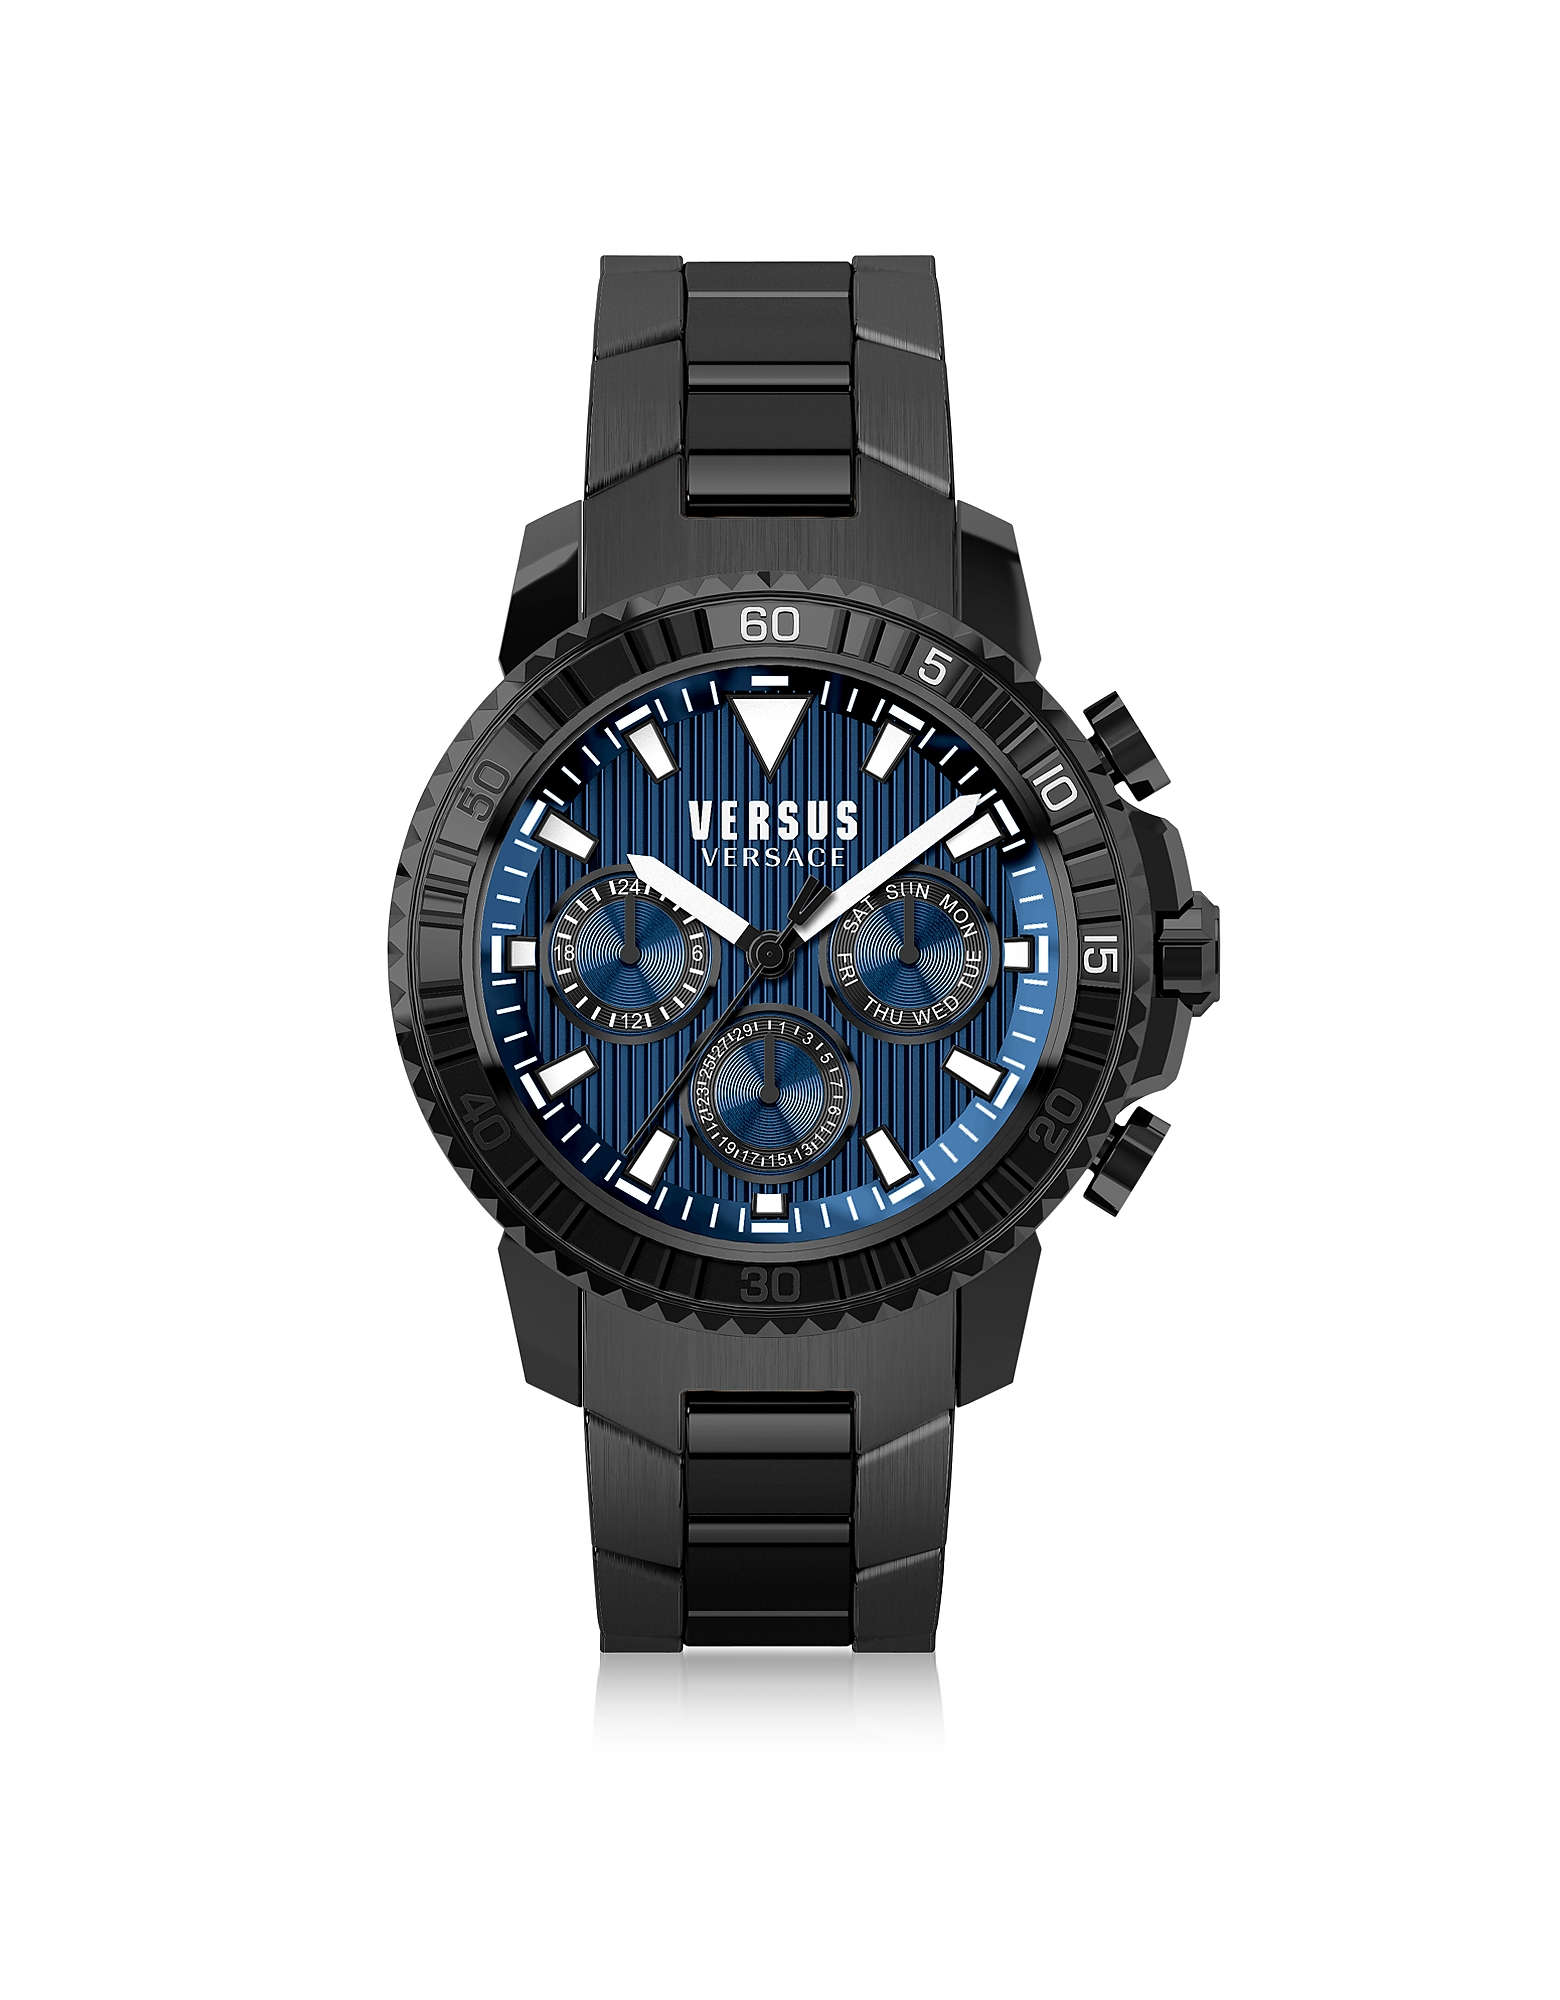 Versace Versus Men's Watches, Aberdeen Black Stainless Steel Men's Chronograph Watch w/Blue Dial